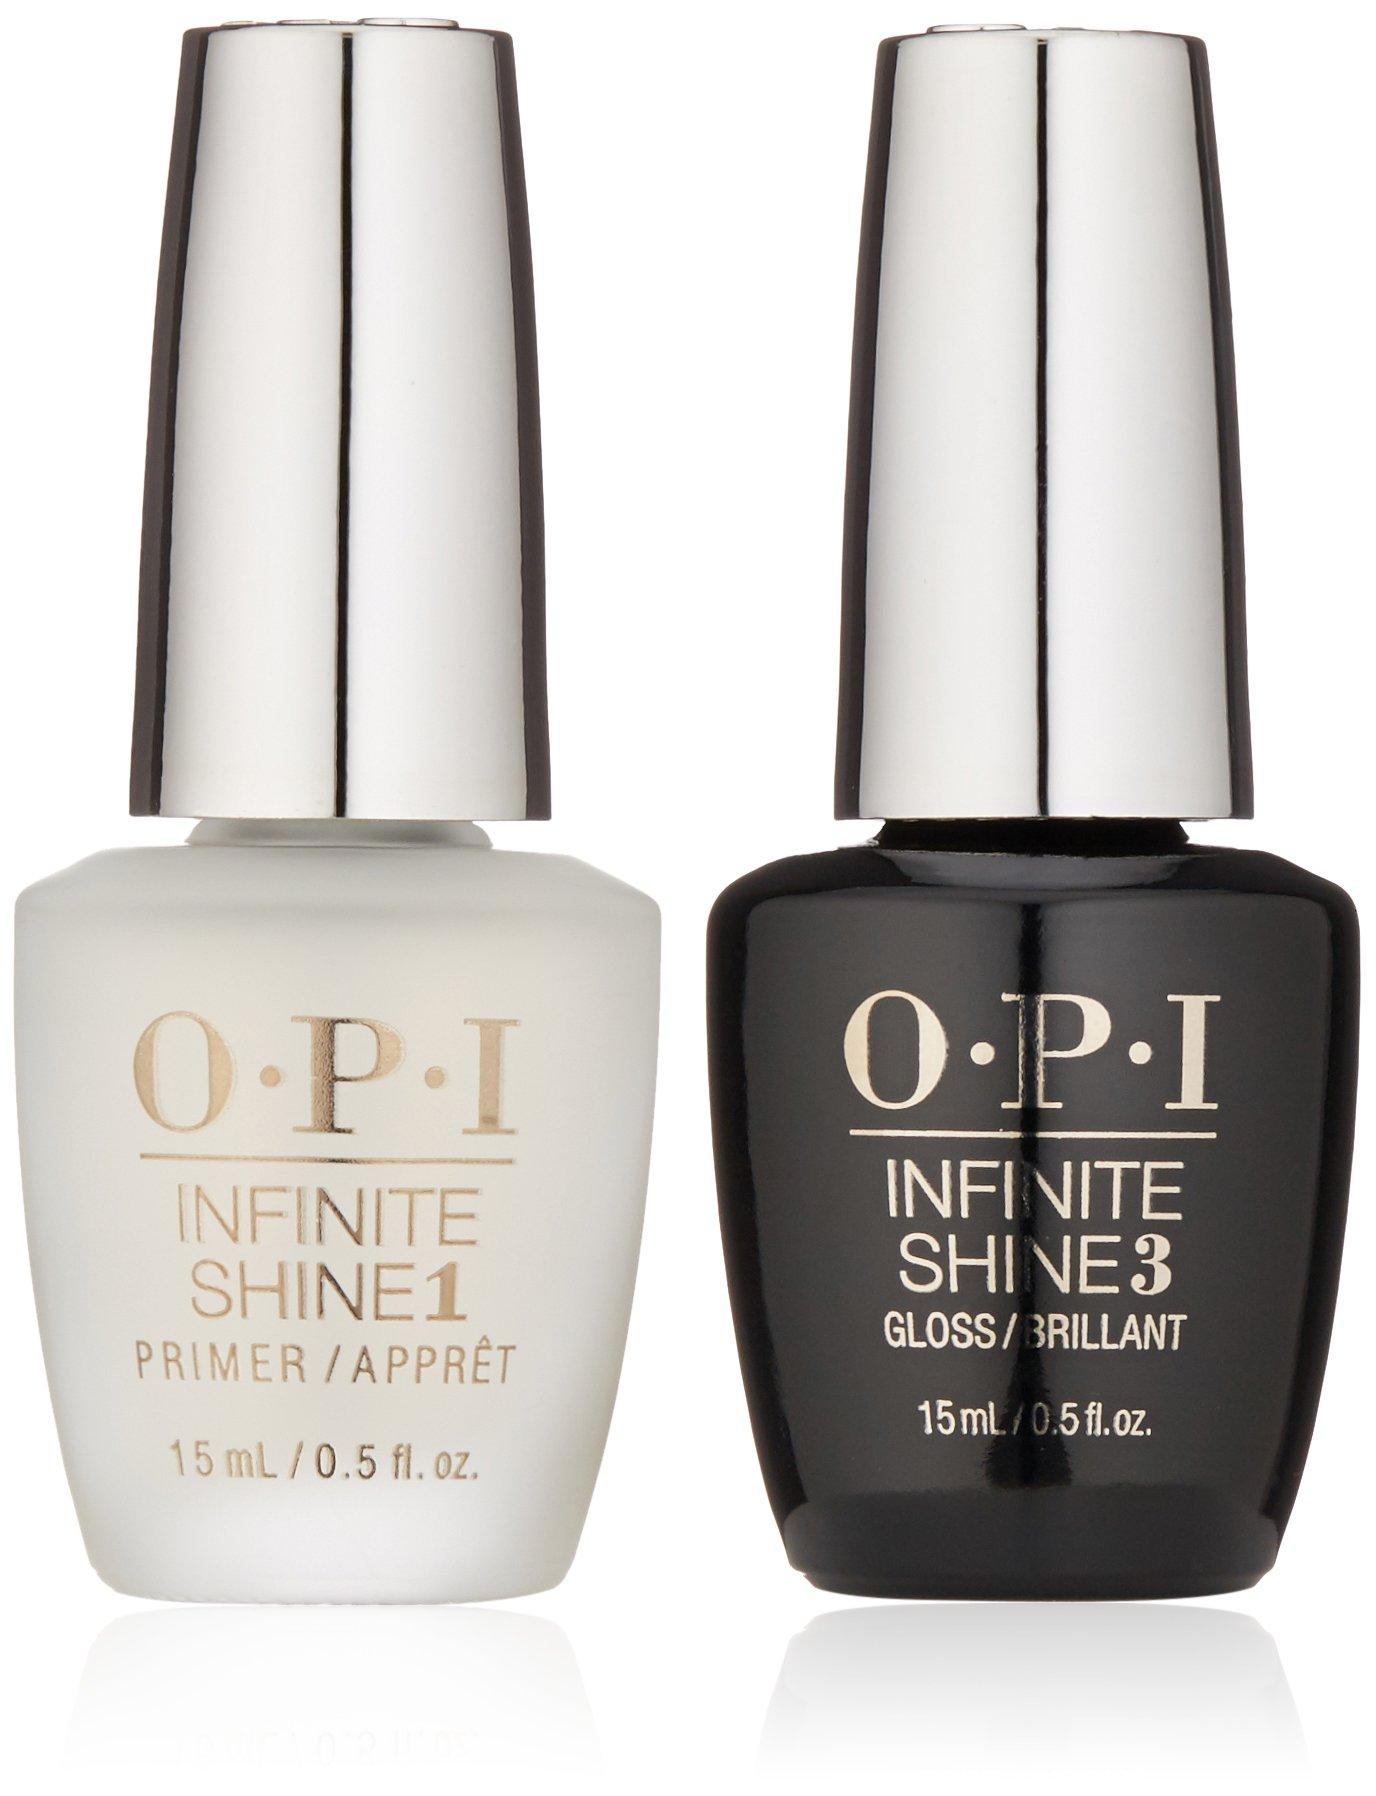 OPI Infinite Shine Nail Polish, Iconic Shades